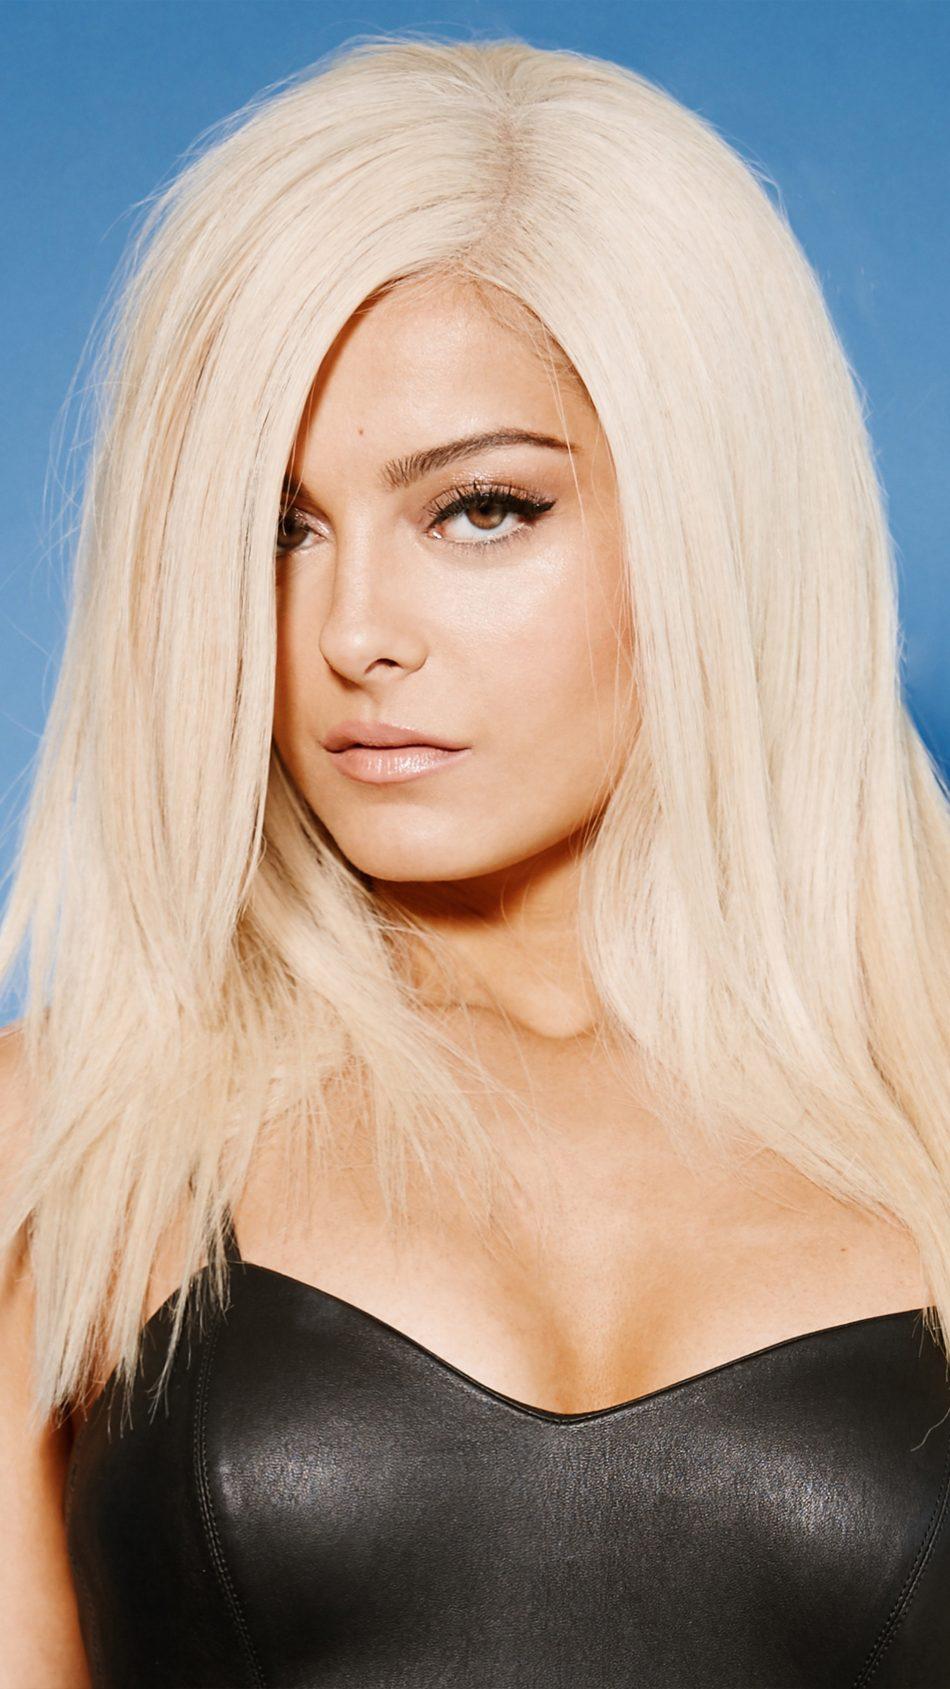 Bebe Rexha Blode Brown Hair 2019 4K Ultra HD Mobile Wallpaper